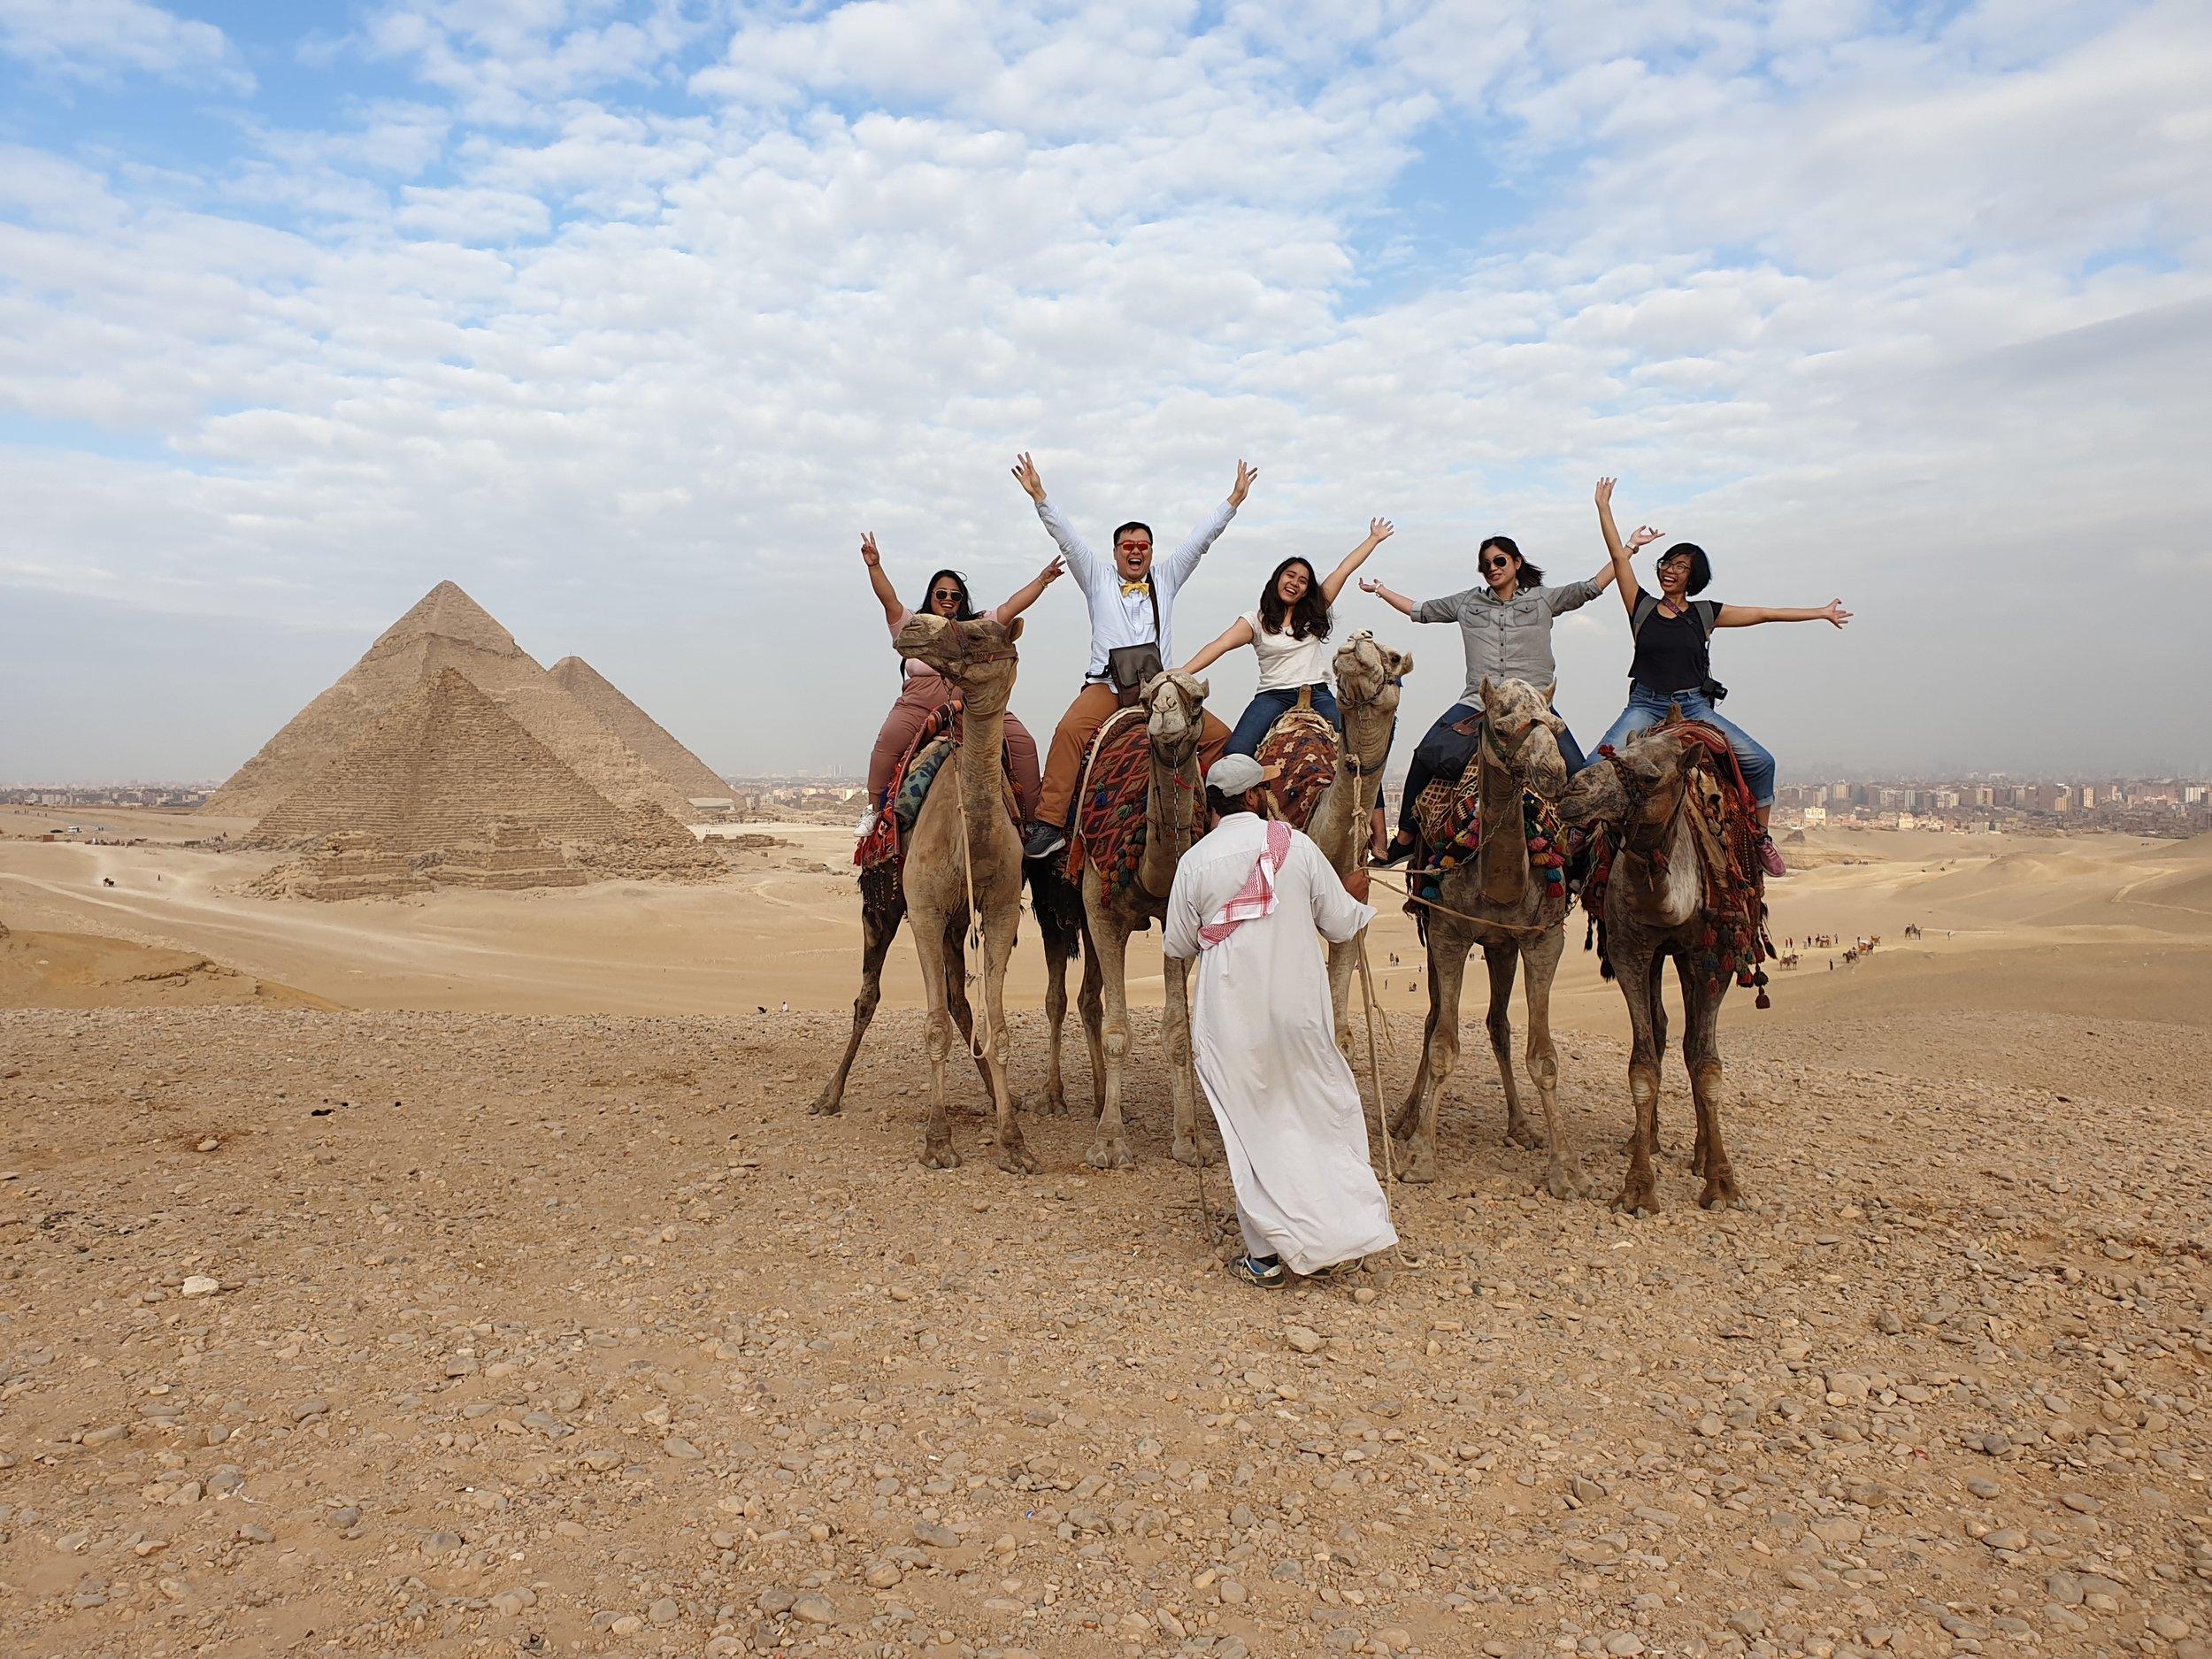 The Parabukas team in Egypt